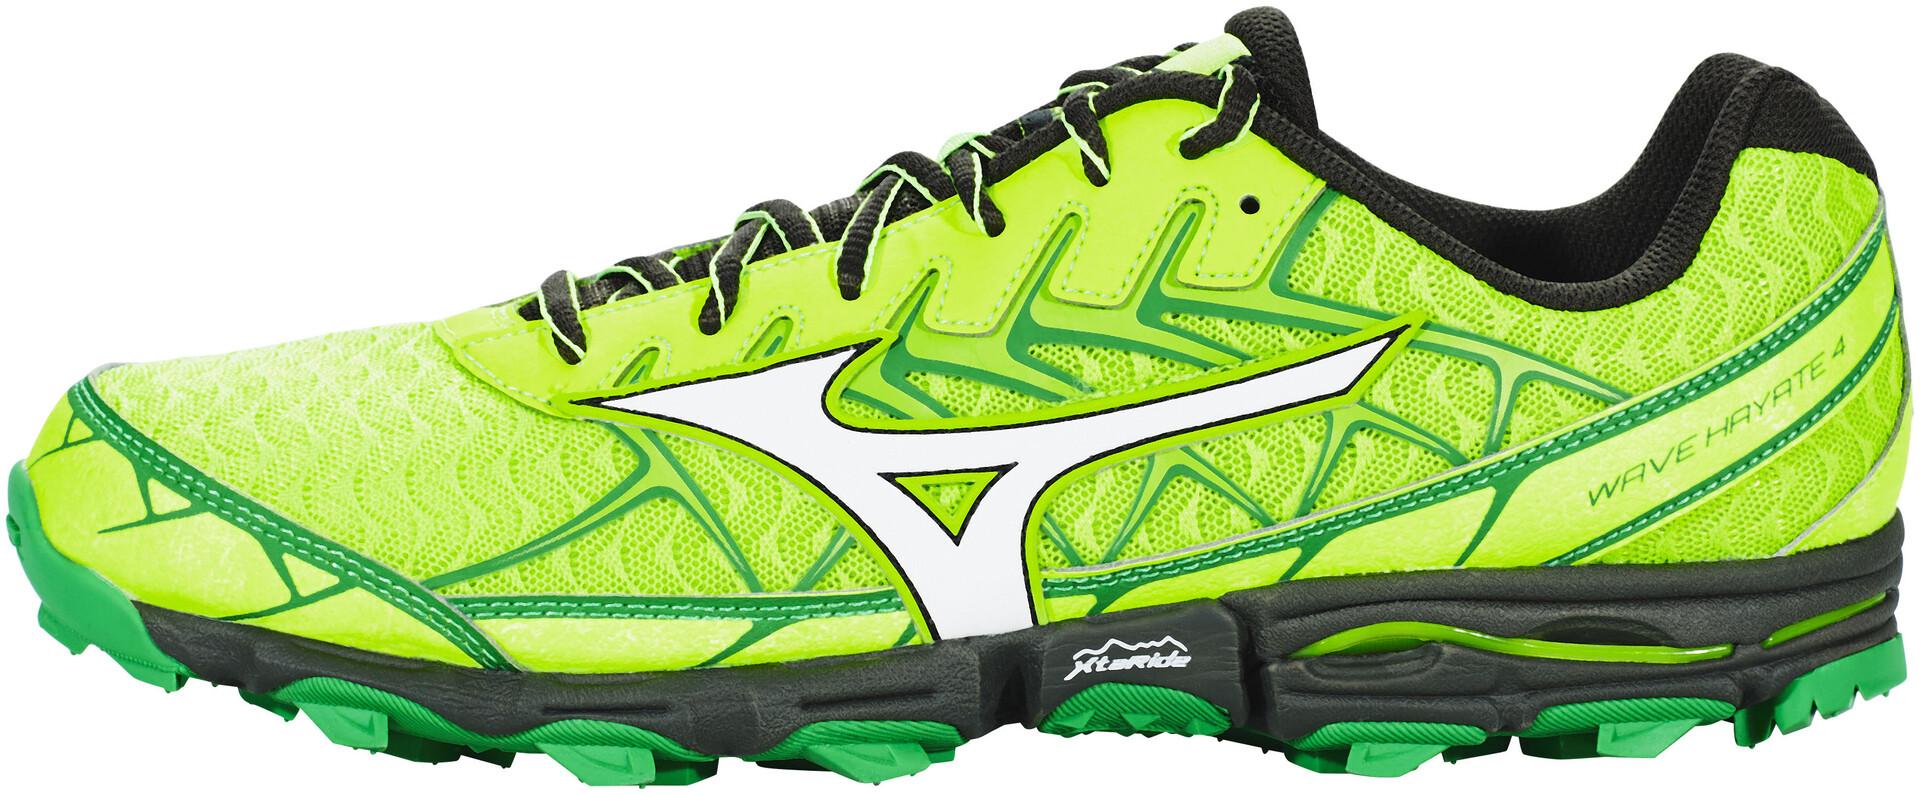 De Mizuno Vert Hayate 4 Boutique Chaussures Running Homme Wave 11xRrq8